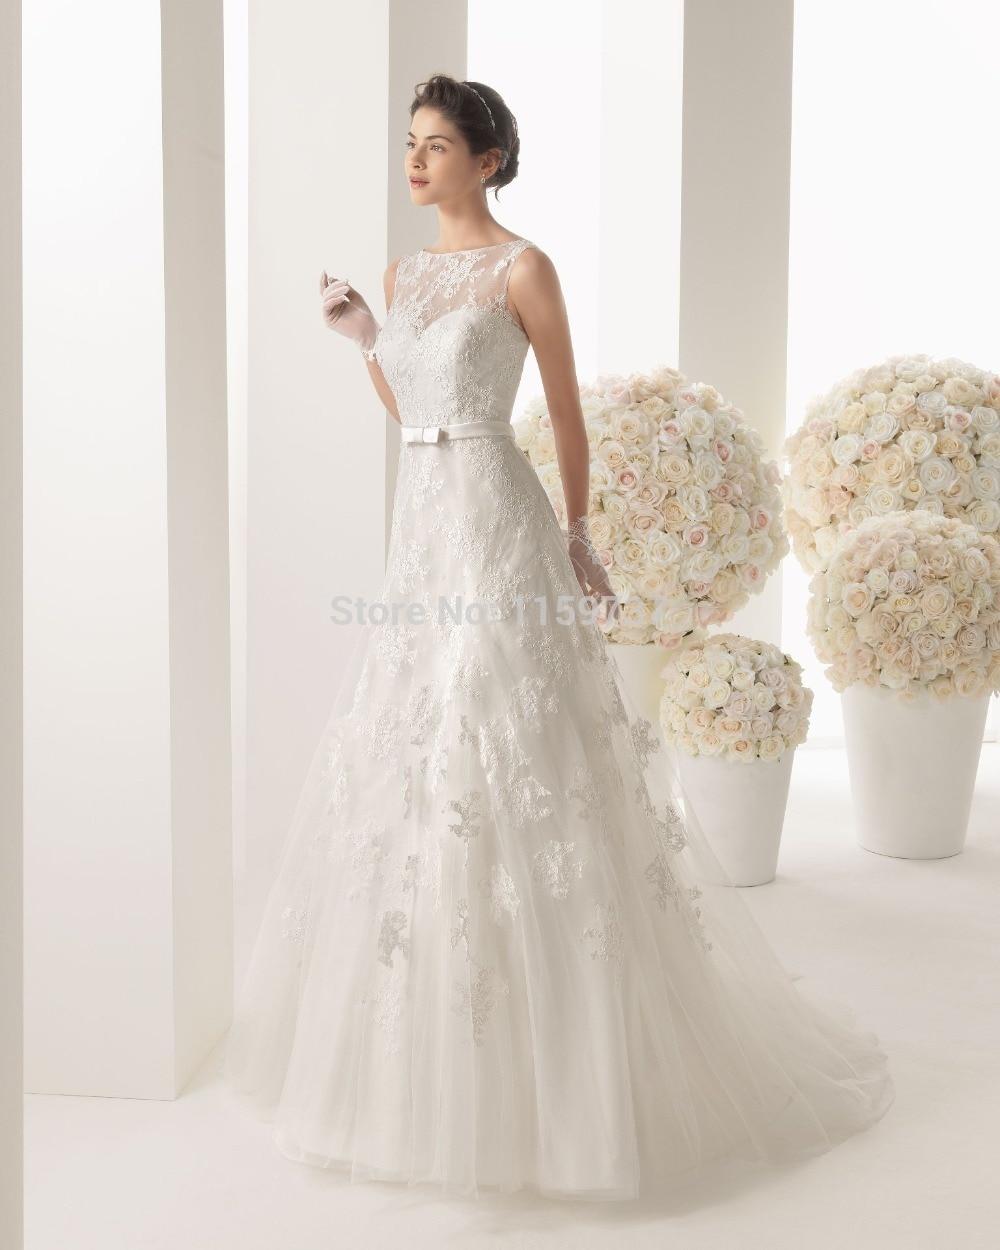 wedding dress flowy lace lace flowy wedding dress Best Nice Design Of Romantic Flowy Wedding Dresses According On In Lace Vine